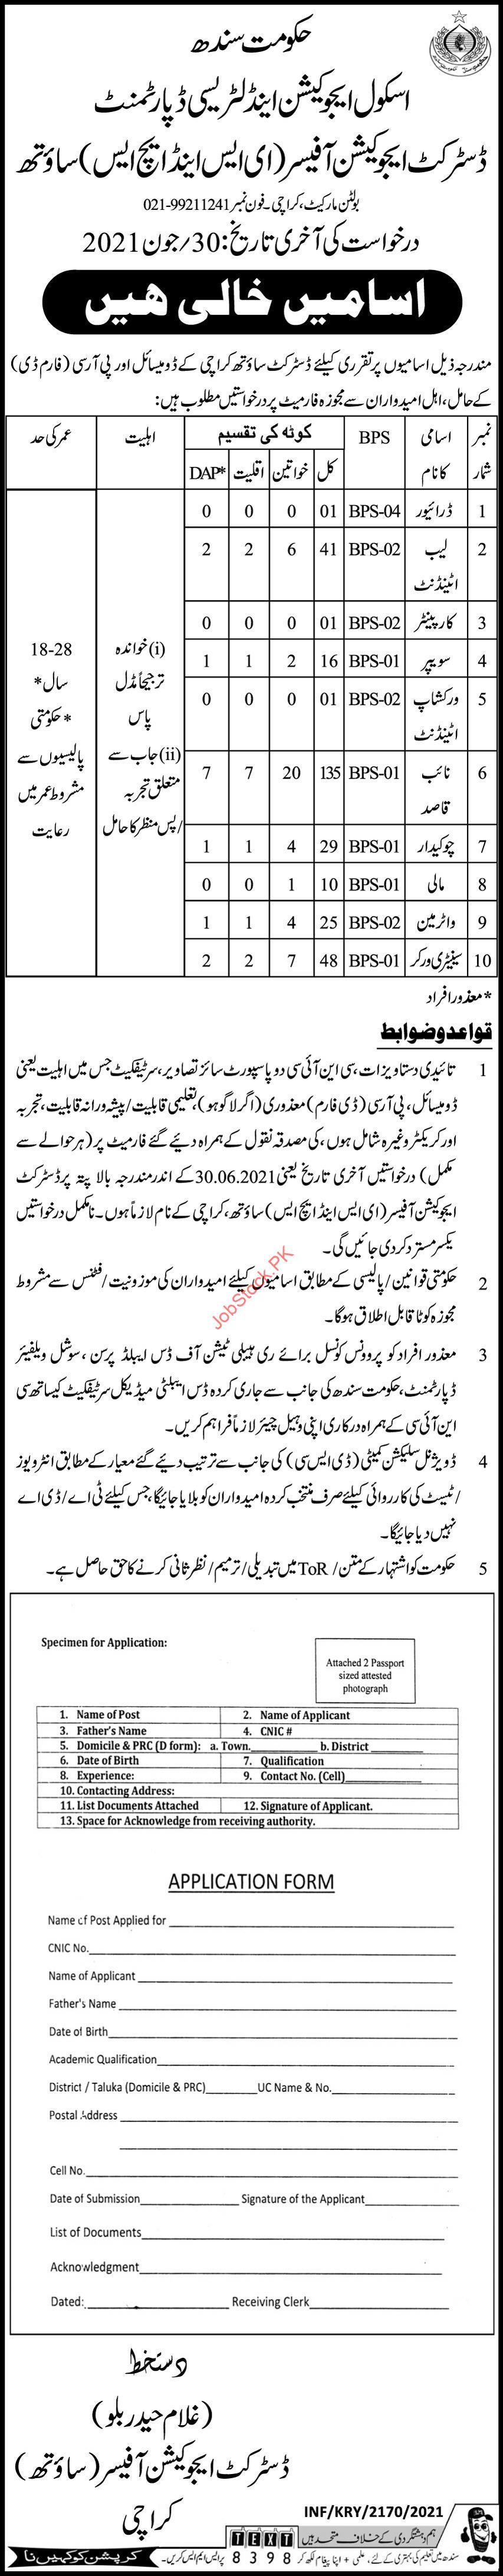 School Education & Literacy Department Karachi Jobs 2021 Advertisement